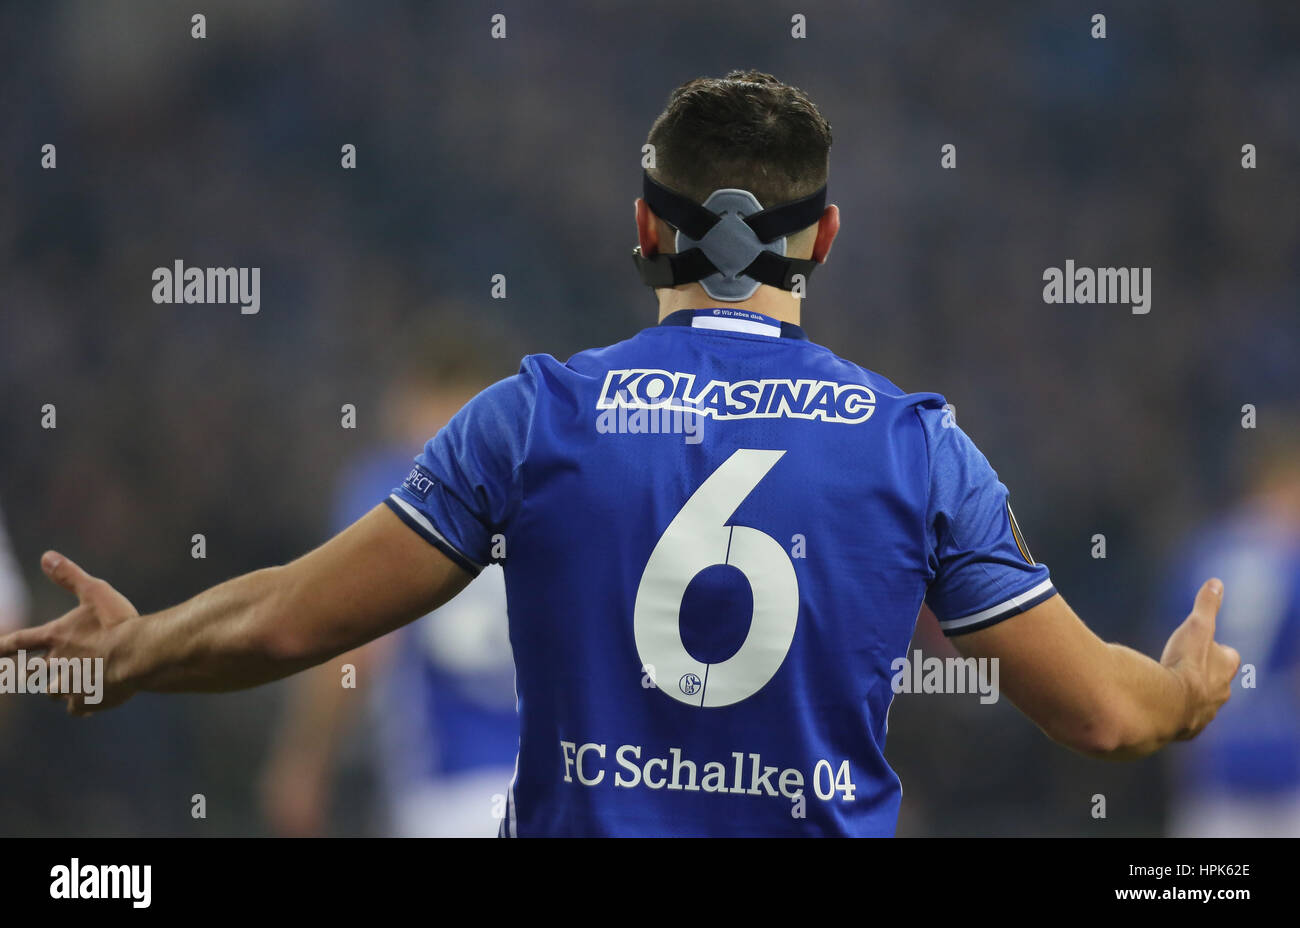 Gelsenkirchen, Germany 22.02.2017, FC Schalke 04 vs PAOK FC, Sead Kolasinac (Schalke) von hinten.               - Stock Image